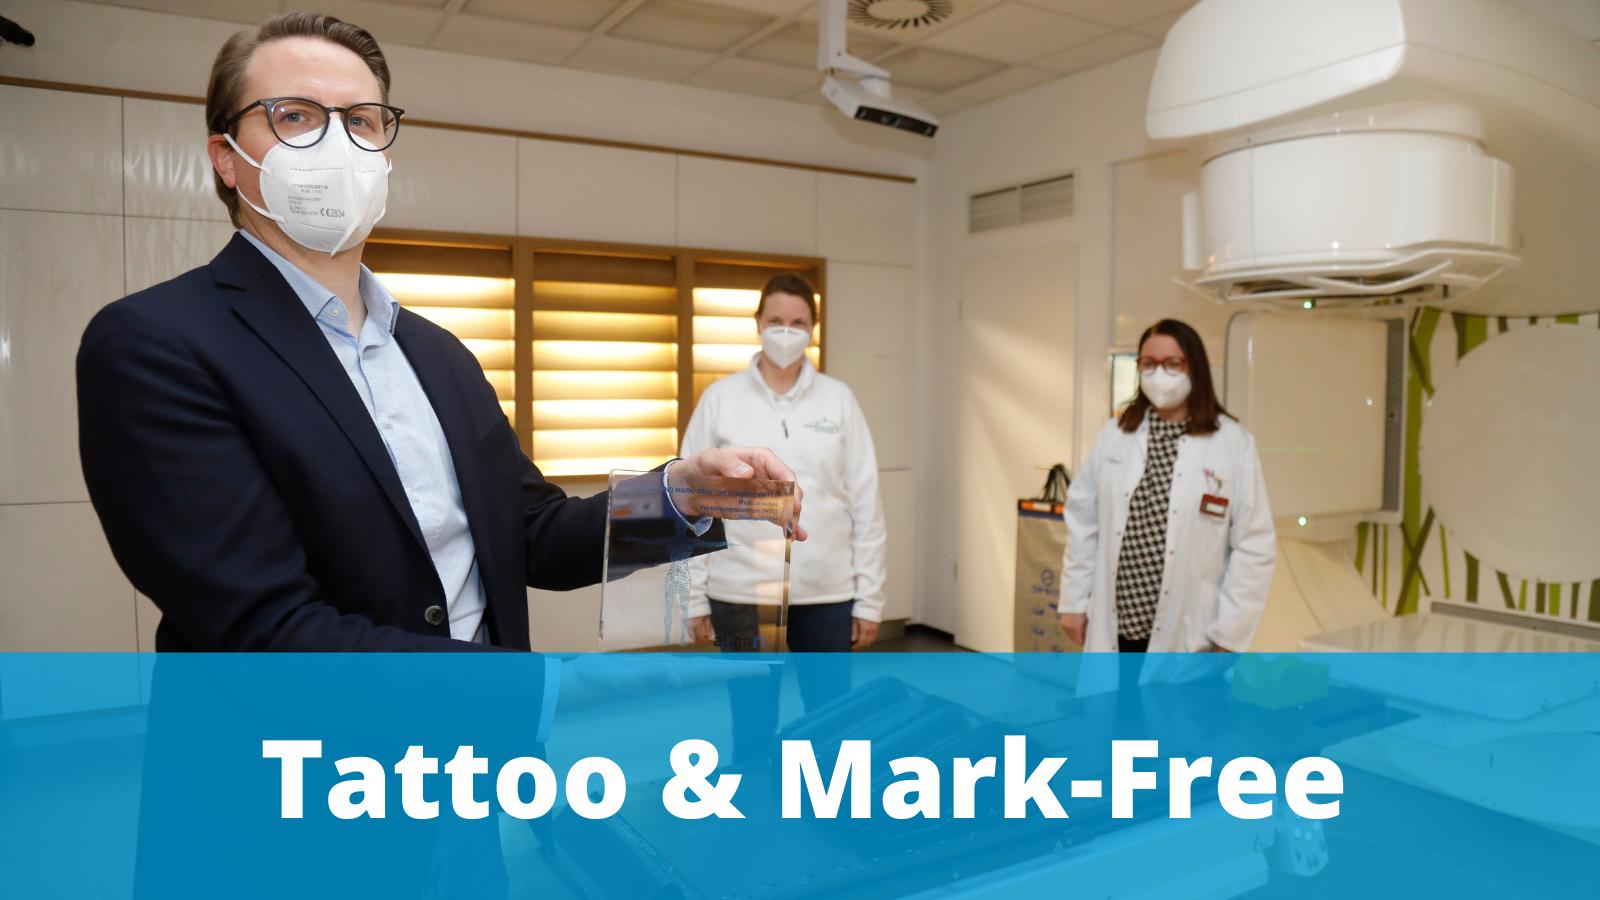 MVZ Taunus GmbH Germany go tattoo and mark-free with AlignRT